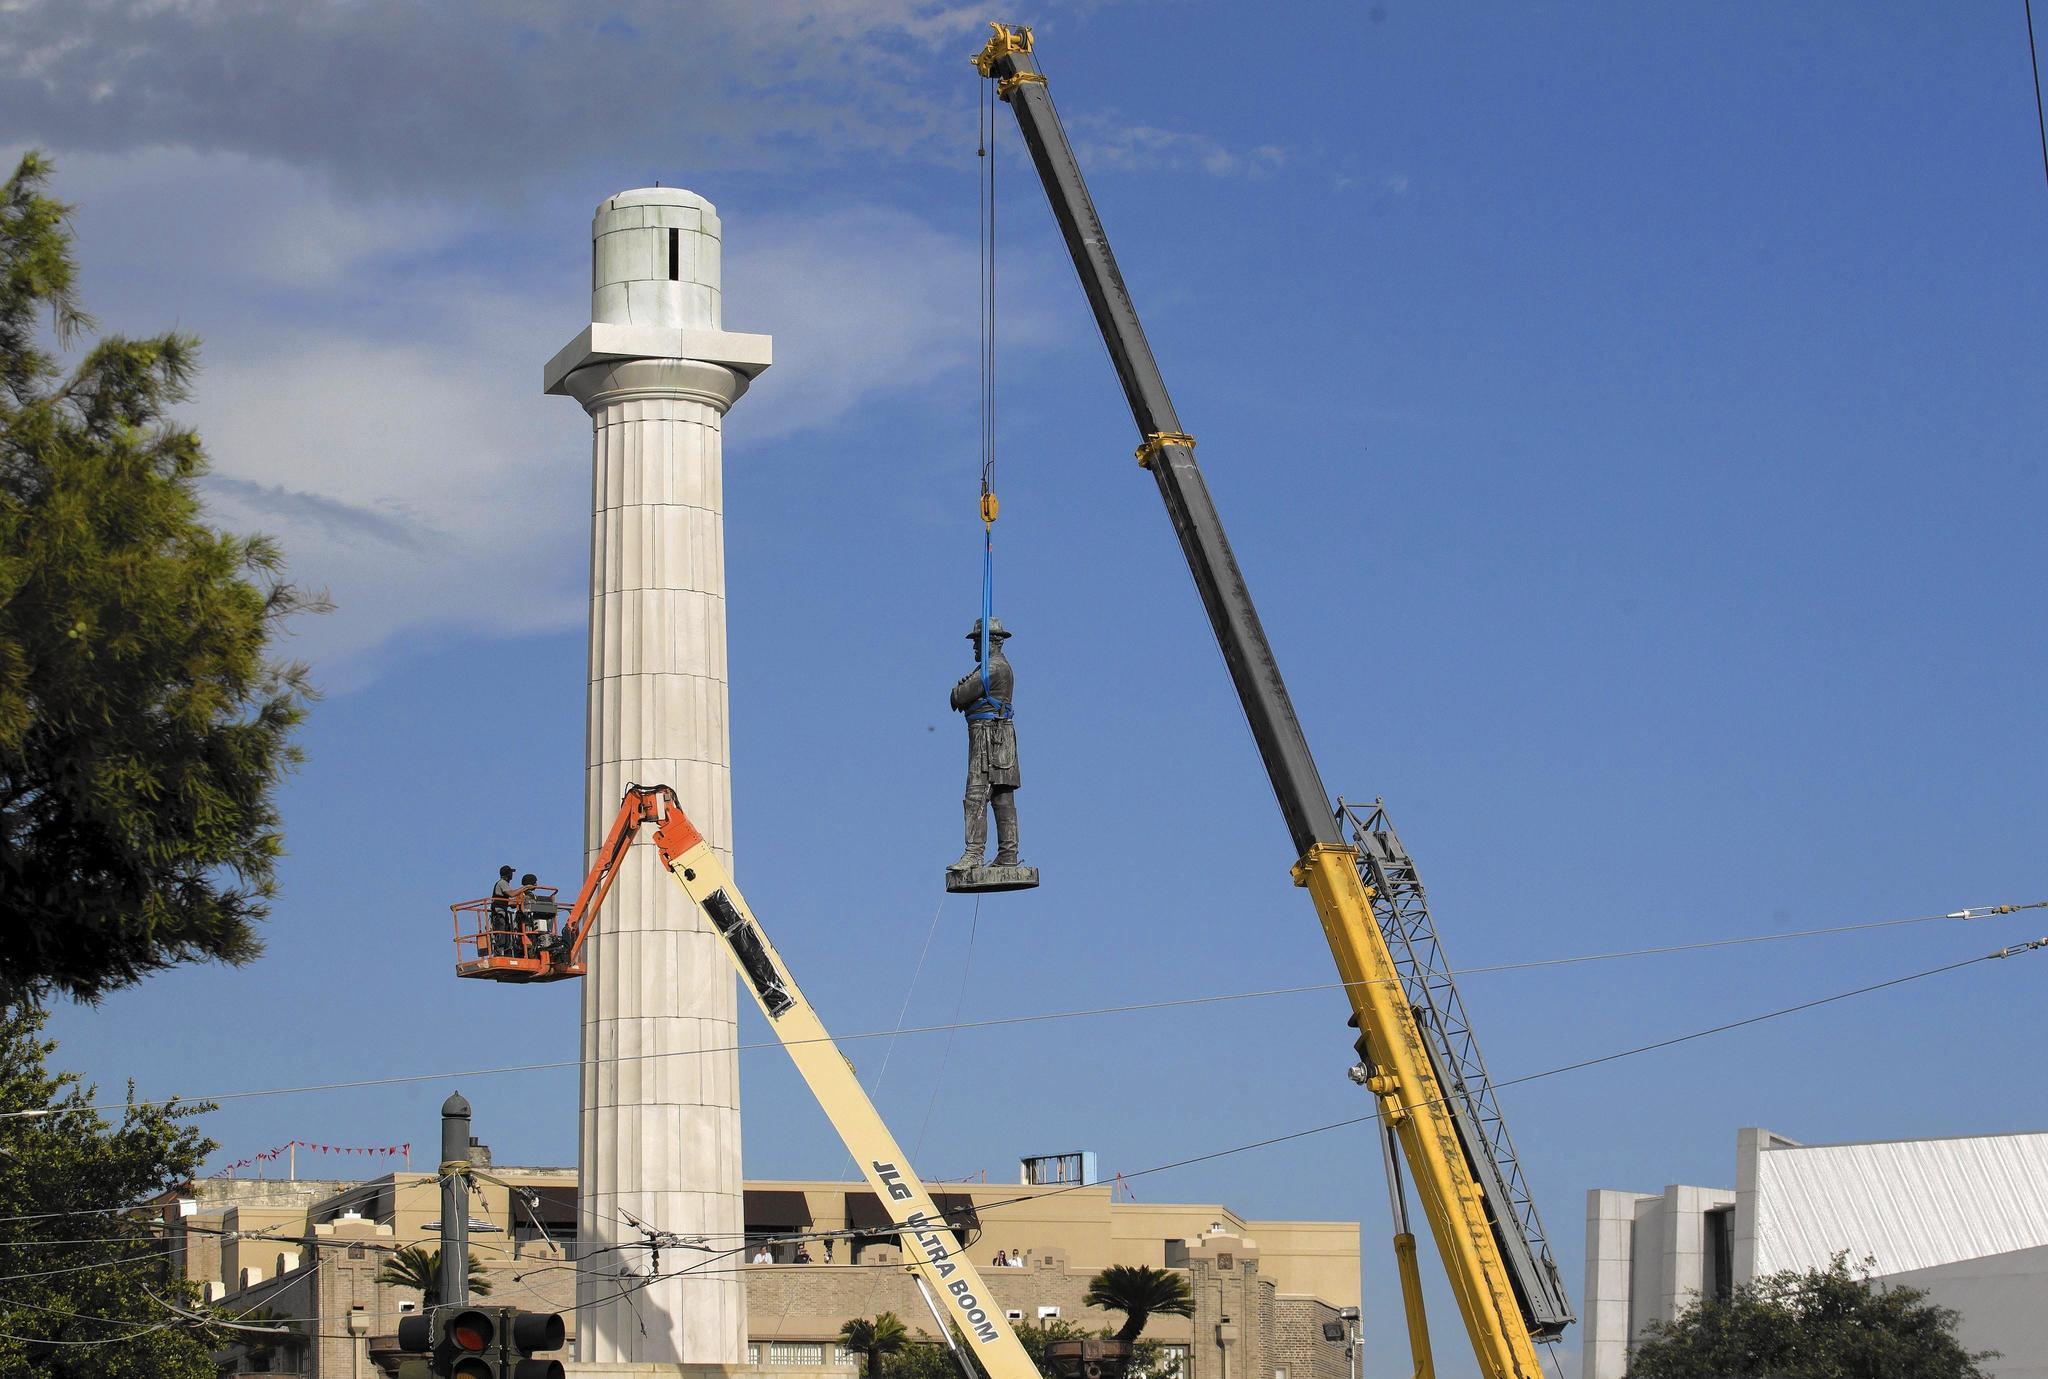 No City Council Vote On Monuments